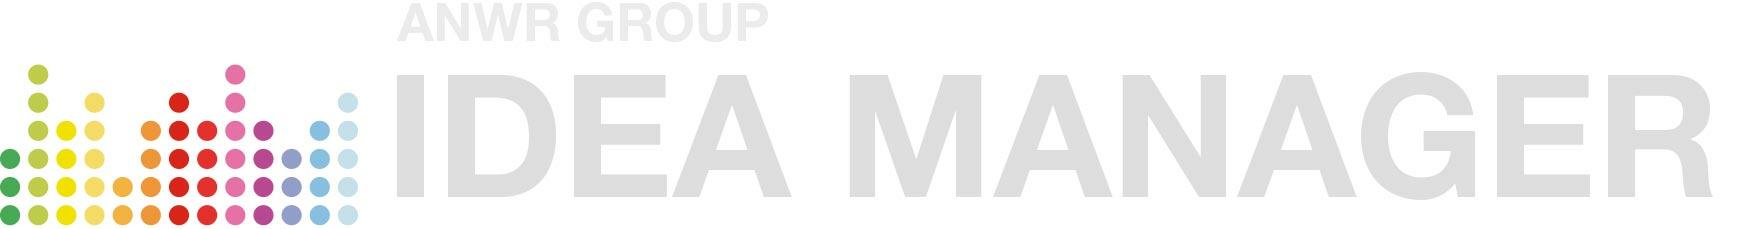 Employer Branding Digital & Motion ANWR Group